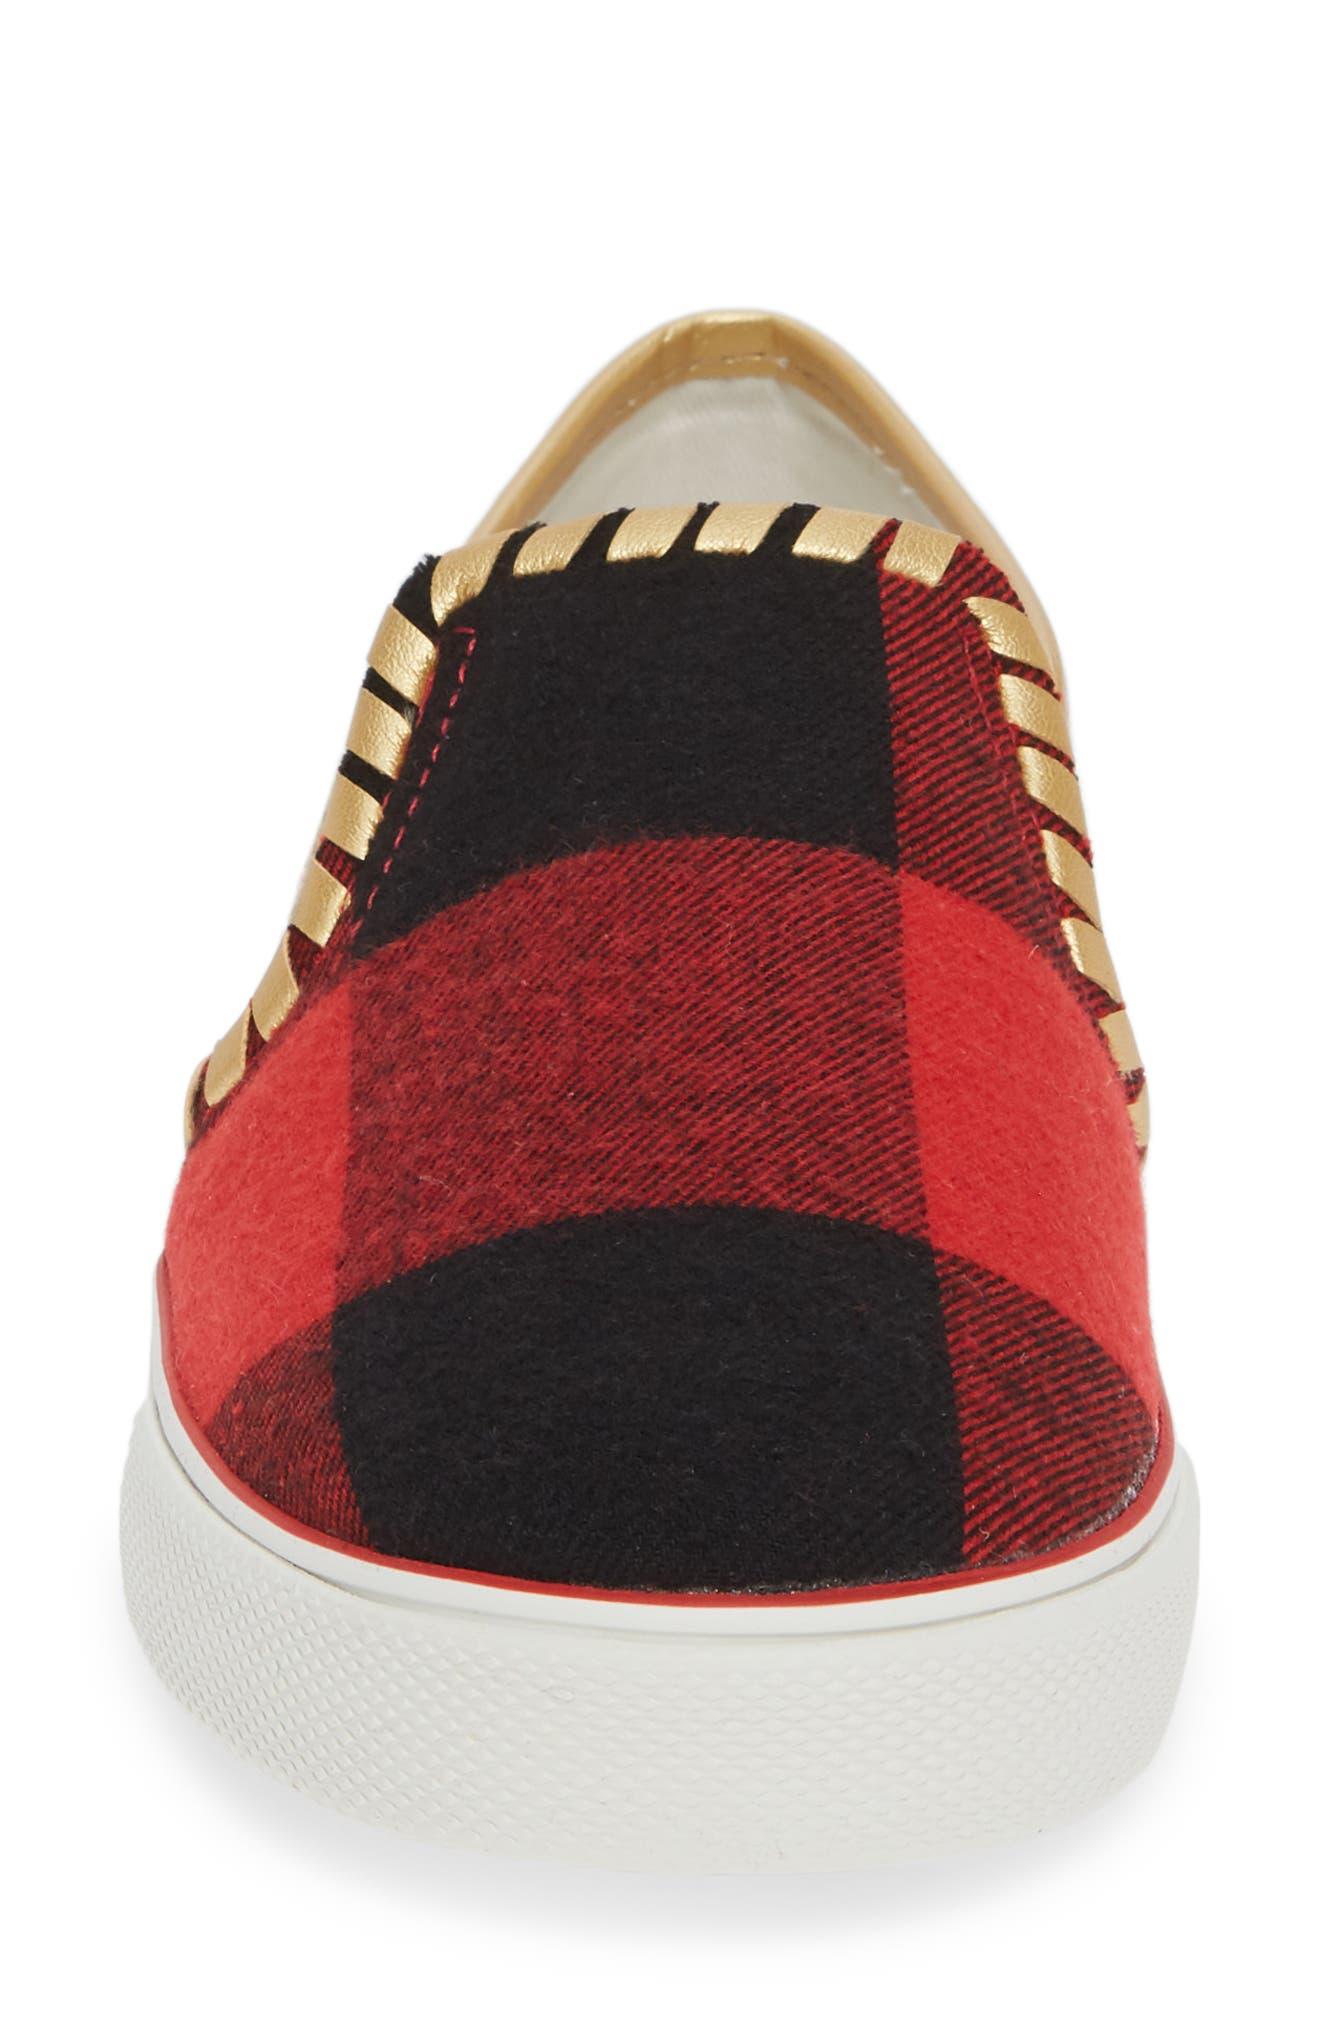 Brynne Slip-On Sneaker,                             Alternate thumbnail 4, color,                             RED/ BLACK FABRIC